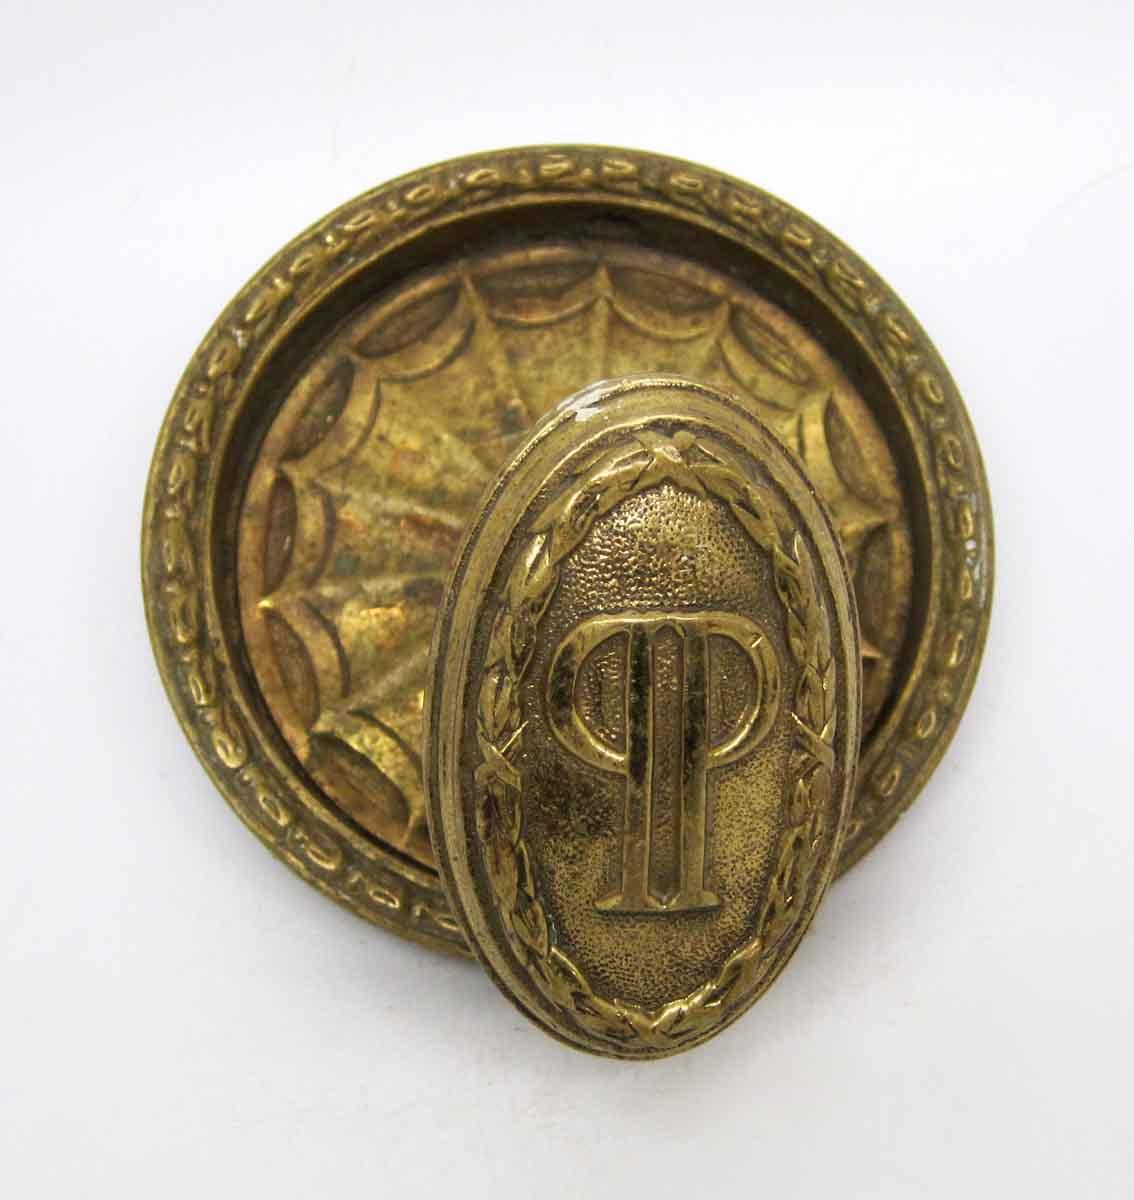 Ornate Brass Knob from New York Plaza Hotel